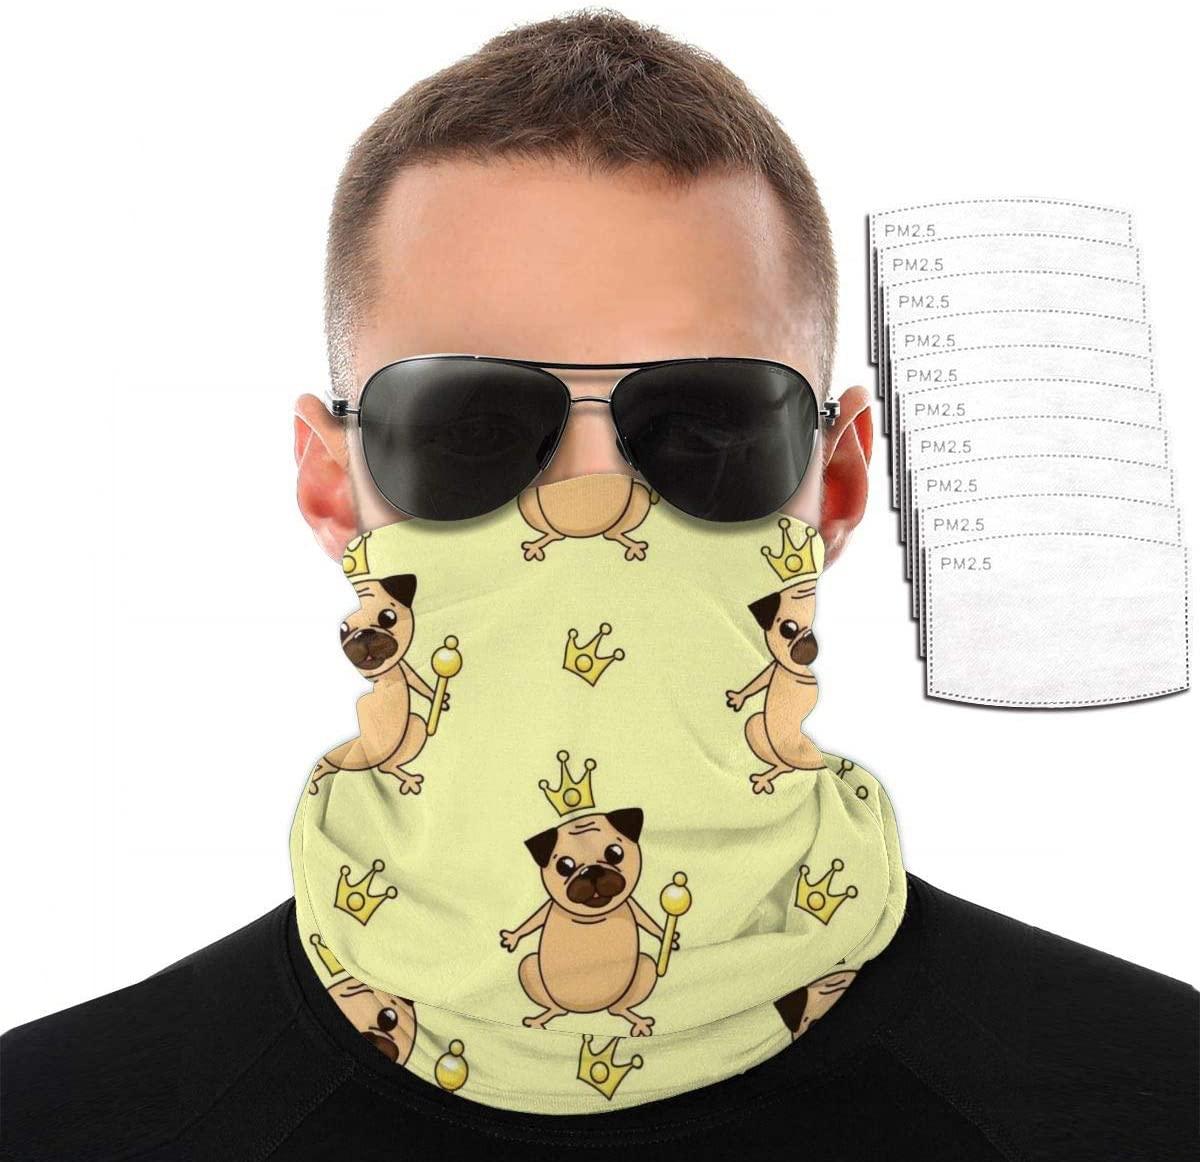 Headwear Unisex Royal Pug Variety Face Towel Headbands Insert Carbon Filter Bandana Neck Gaiter Face Protector For Dust Outdoors